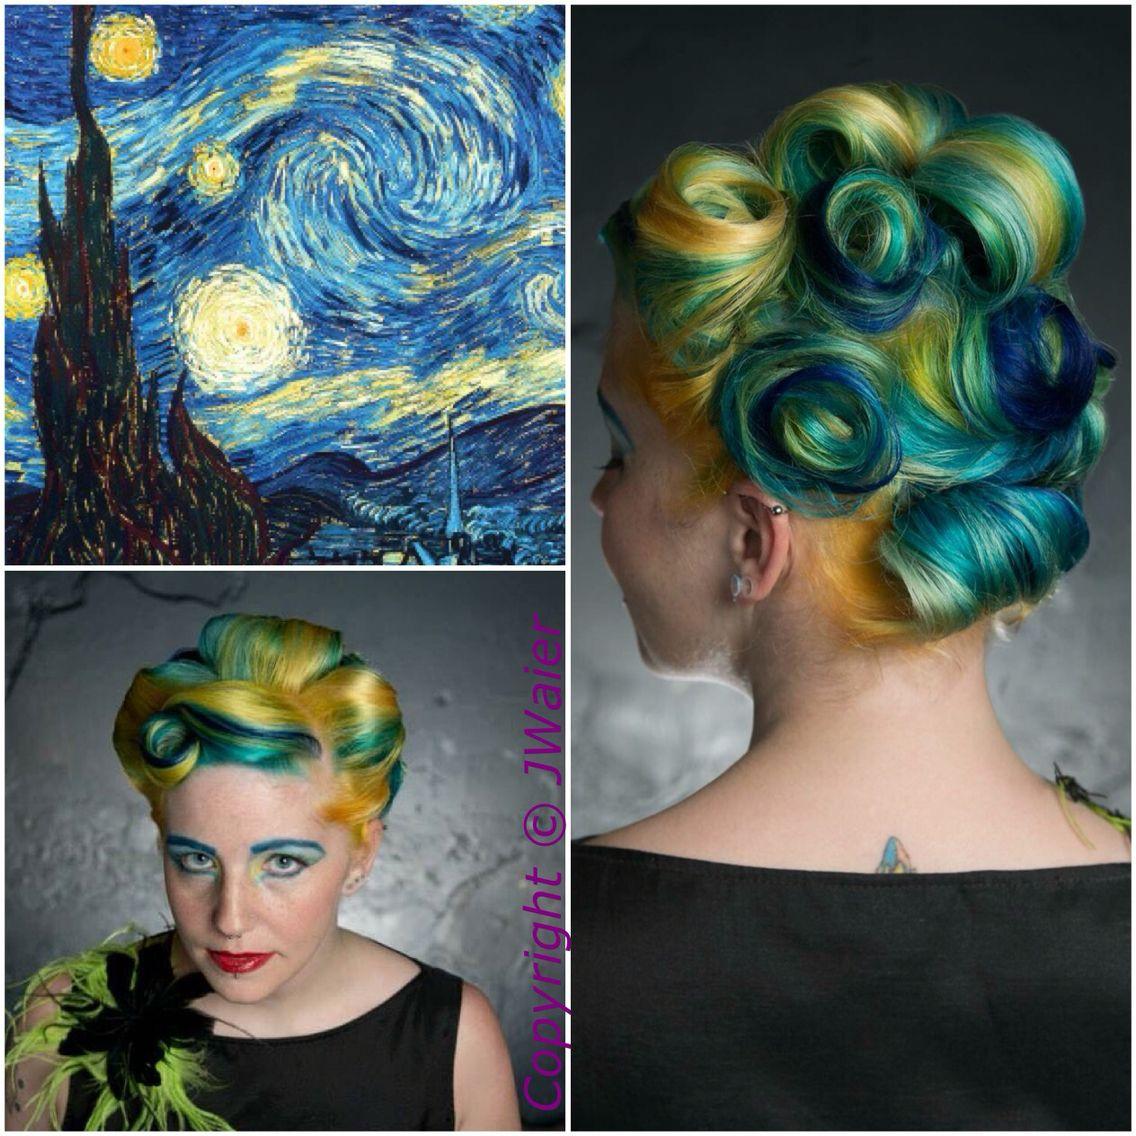 Van Goghs A Starry Night Inspired Hair Color Using Pravana Vivids